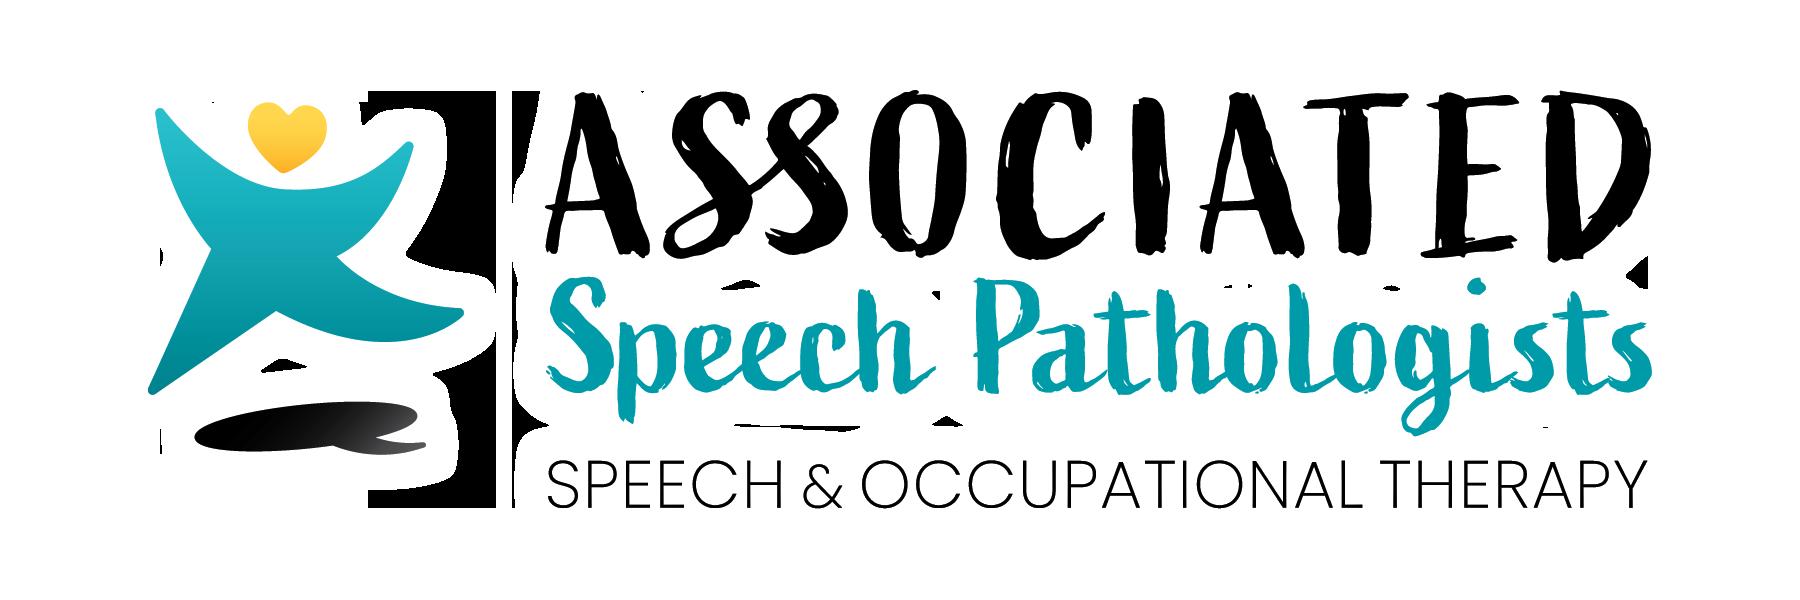 Associated Speech Pathologists